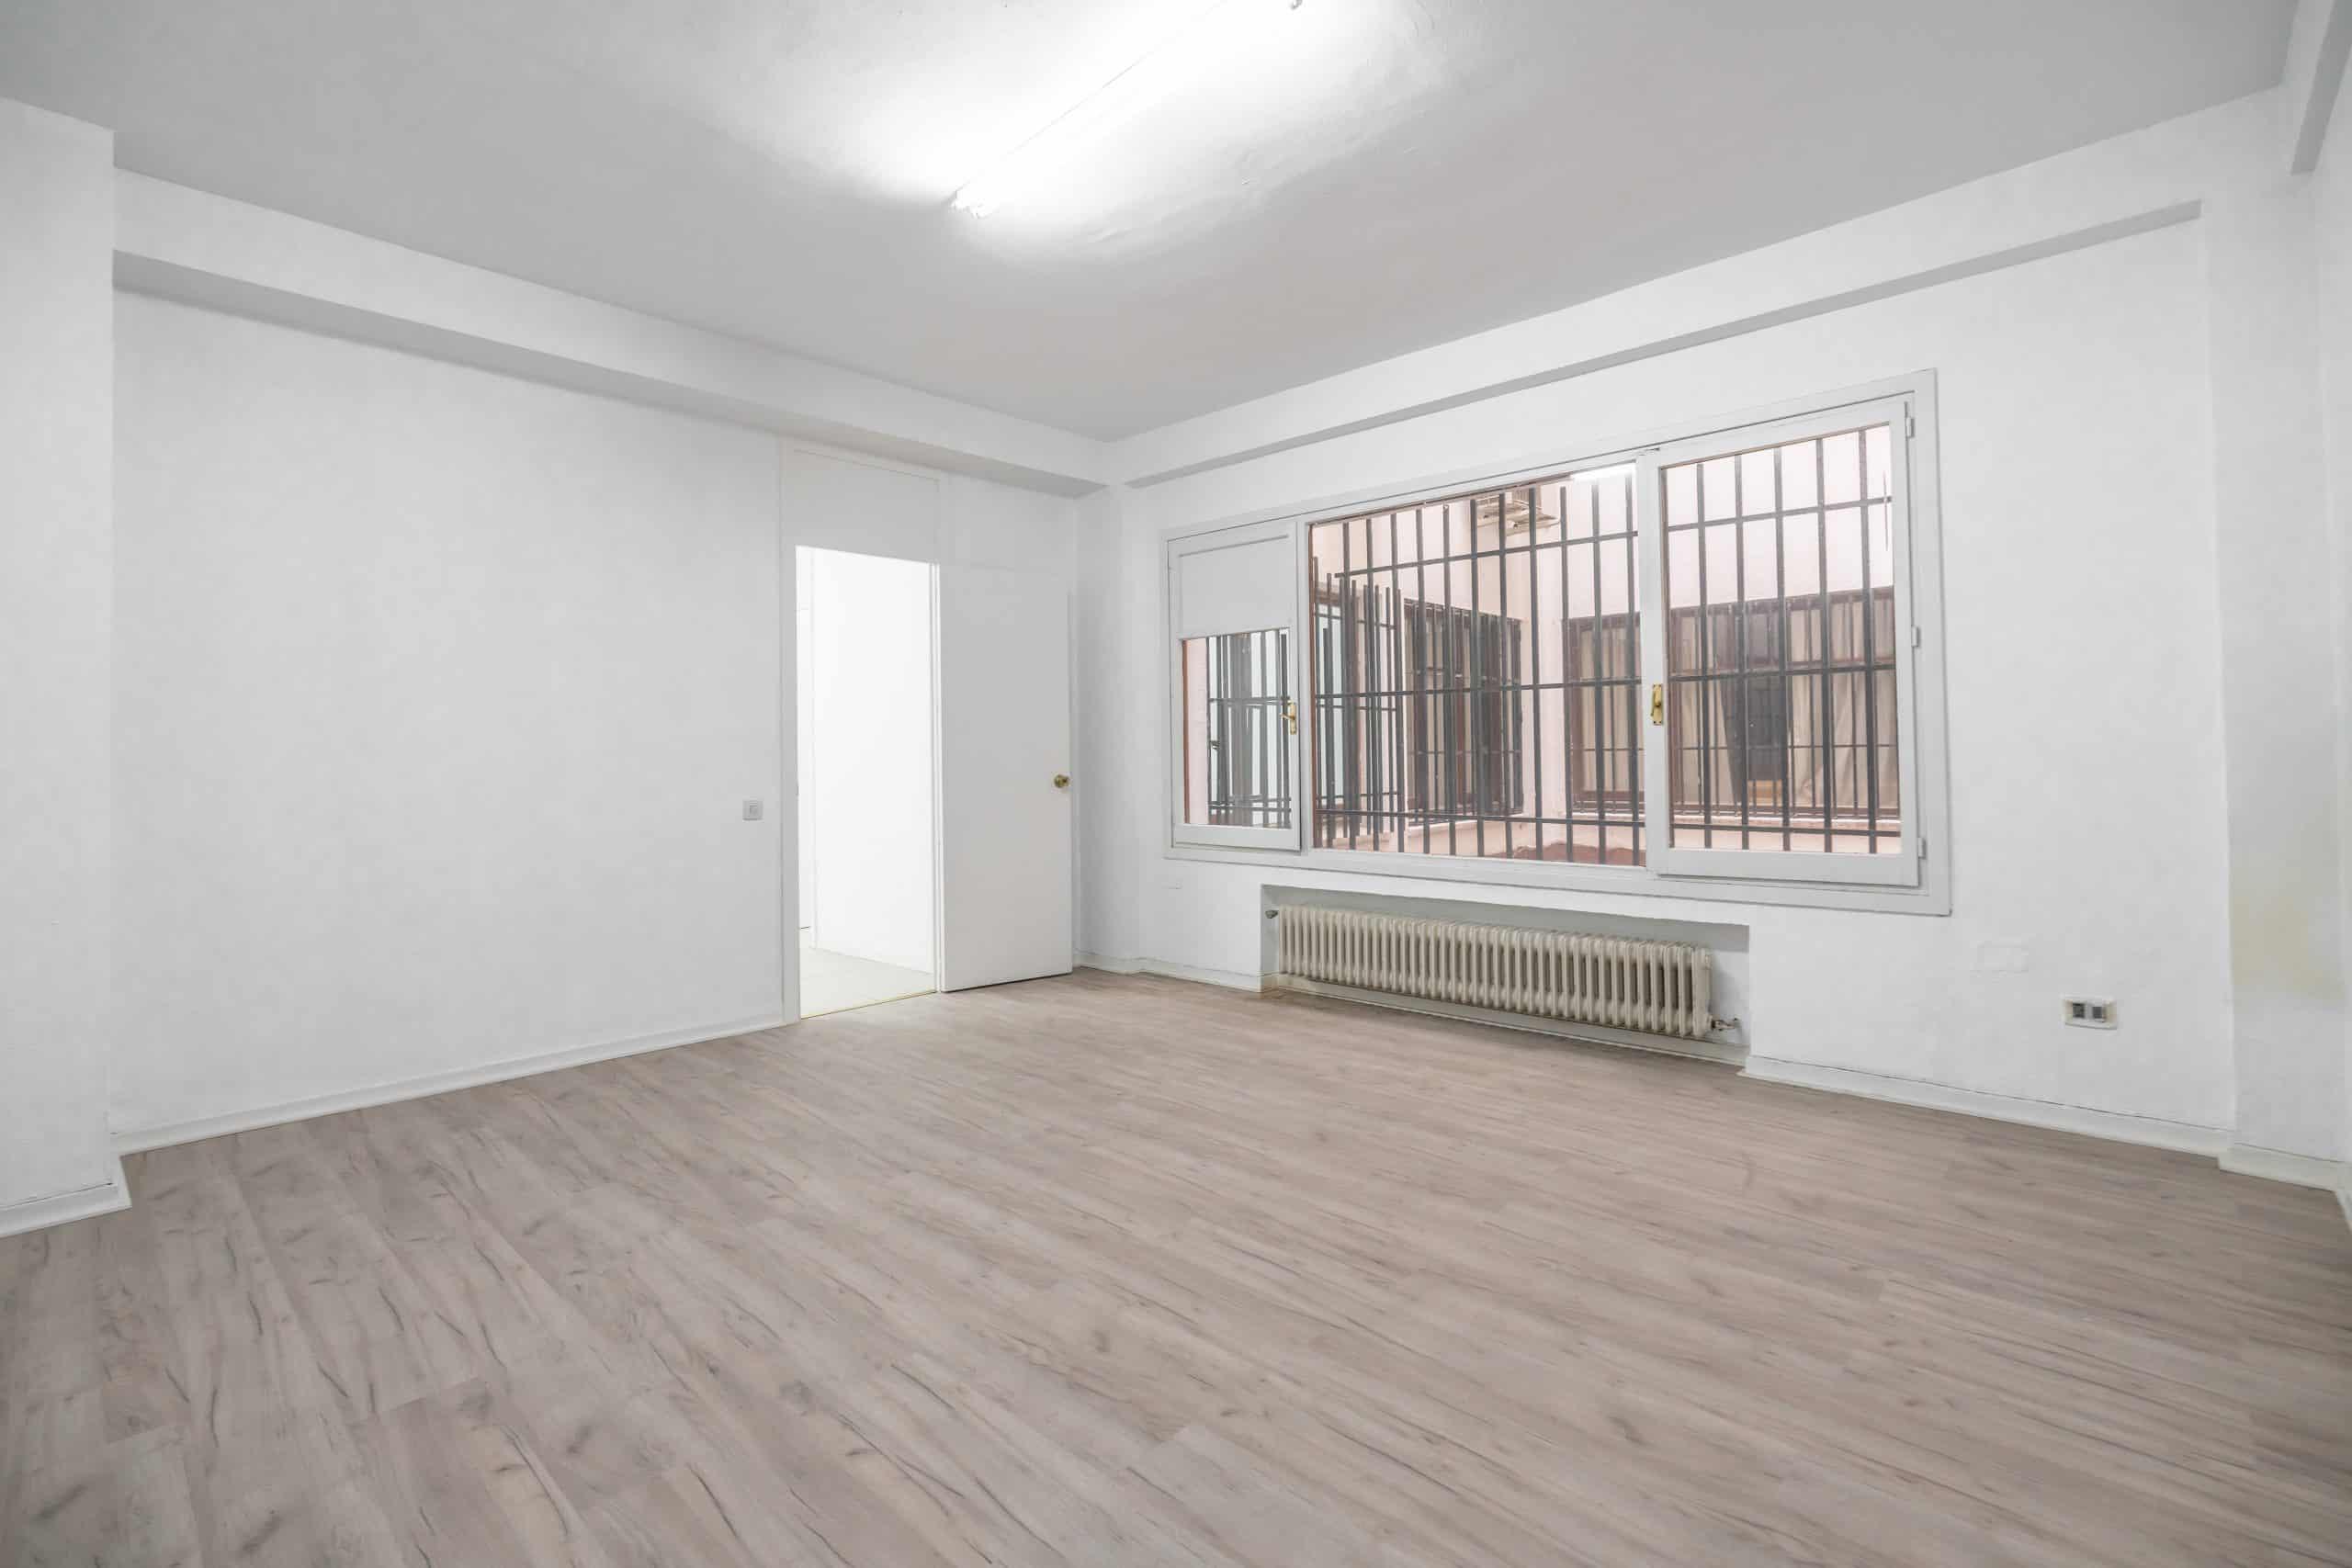 Agencia Inmobiliaria de Madrid-FUTUROCASA-Zona ARGANZUELA-LEGAZPI -calle Modesto Lafuente 41,1ºC estancia 2